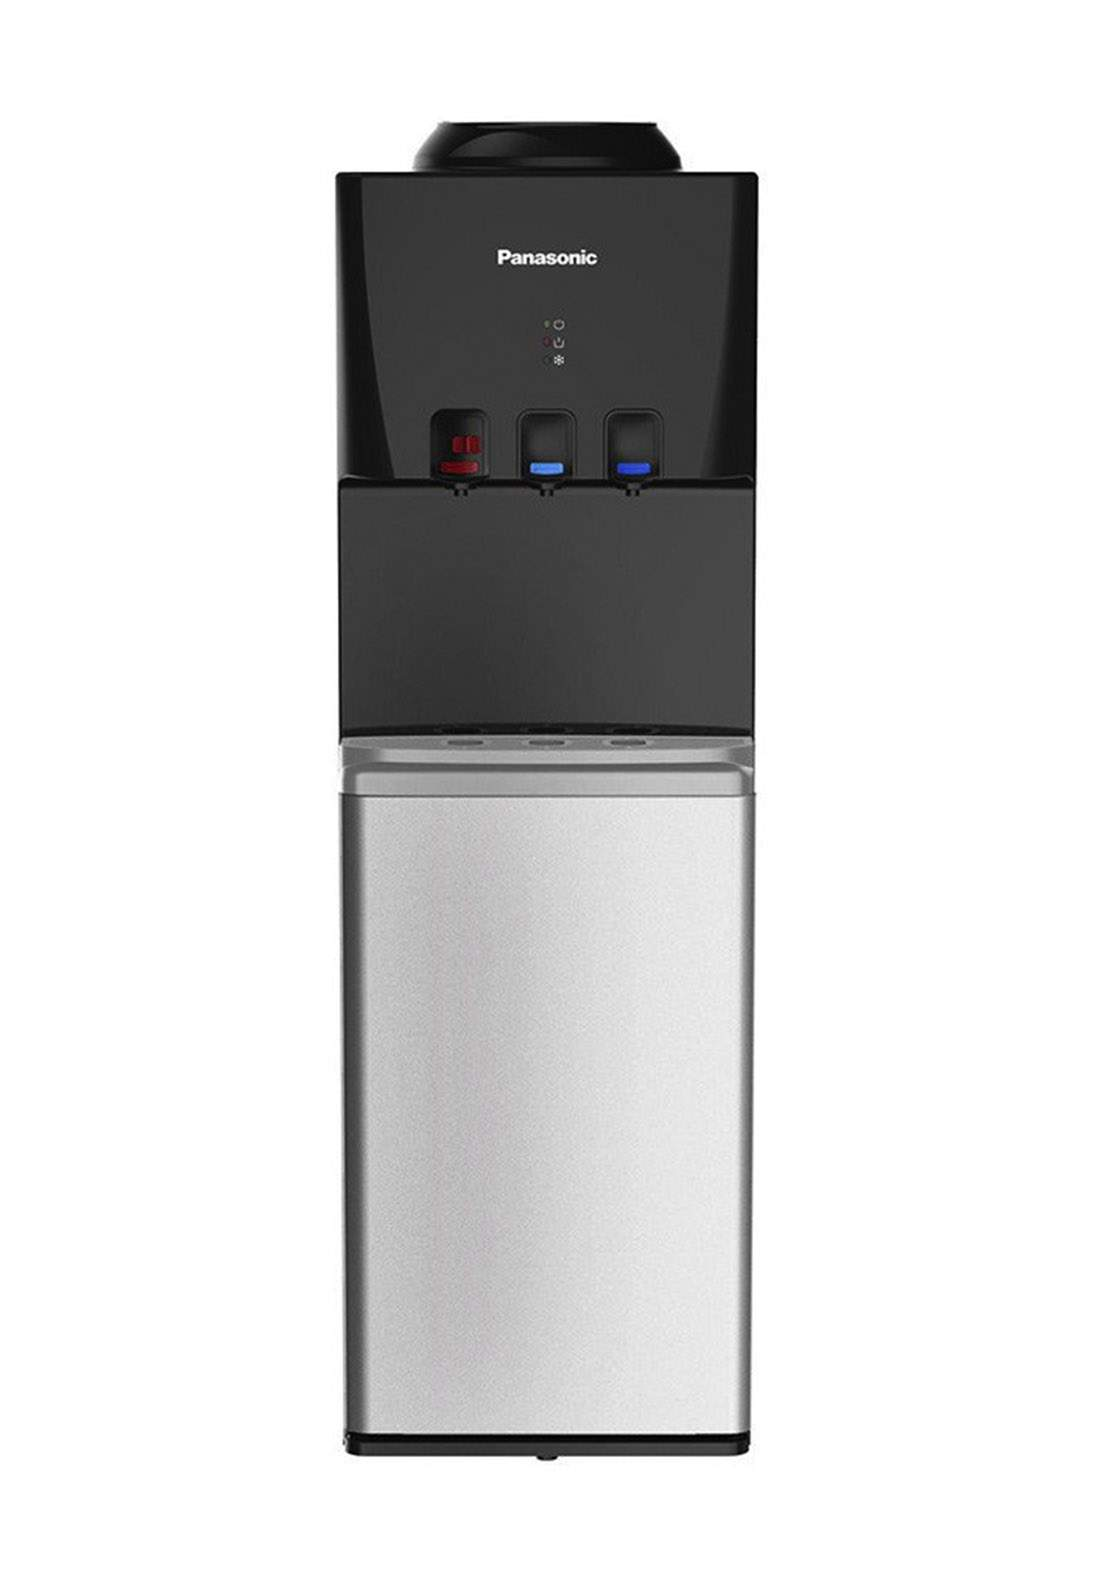 Panasonic (SDM-WD3128TG) 3 Water Tap Free Standing Water Dispenser براد ماء